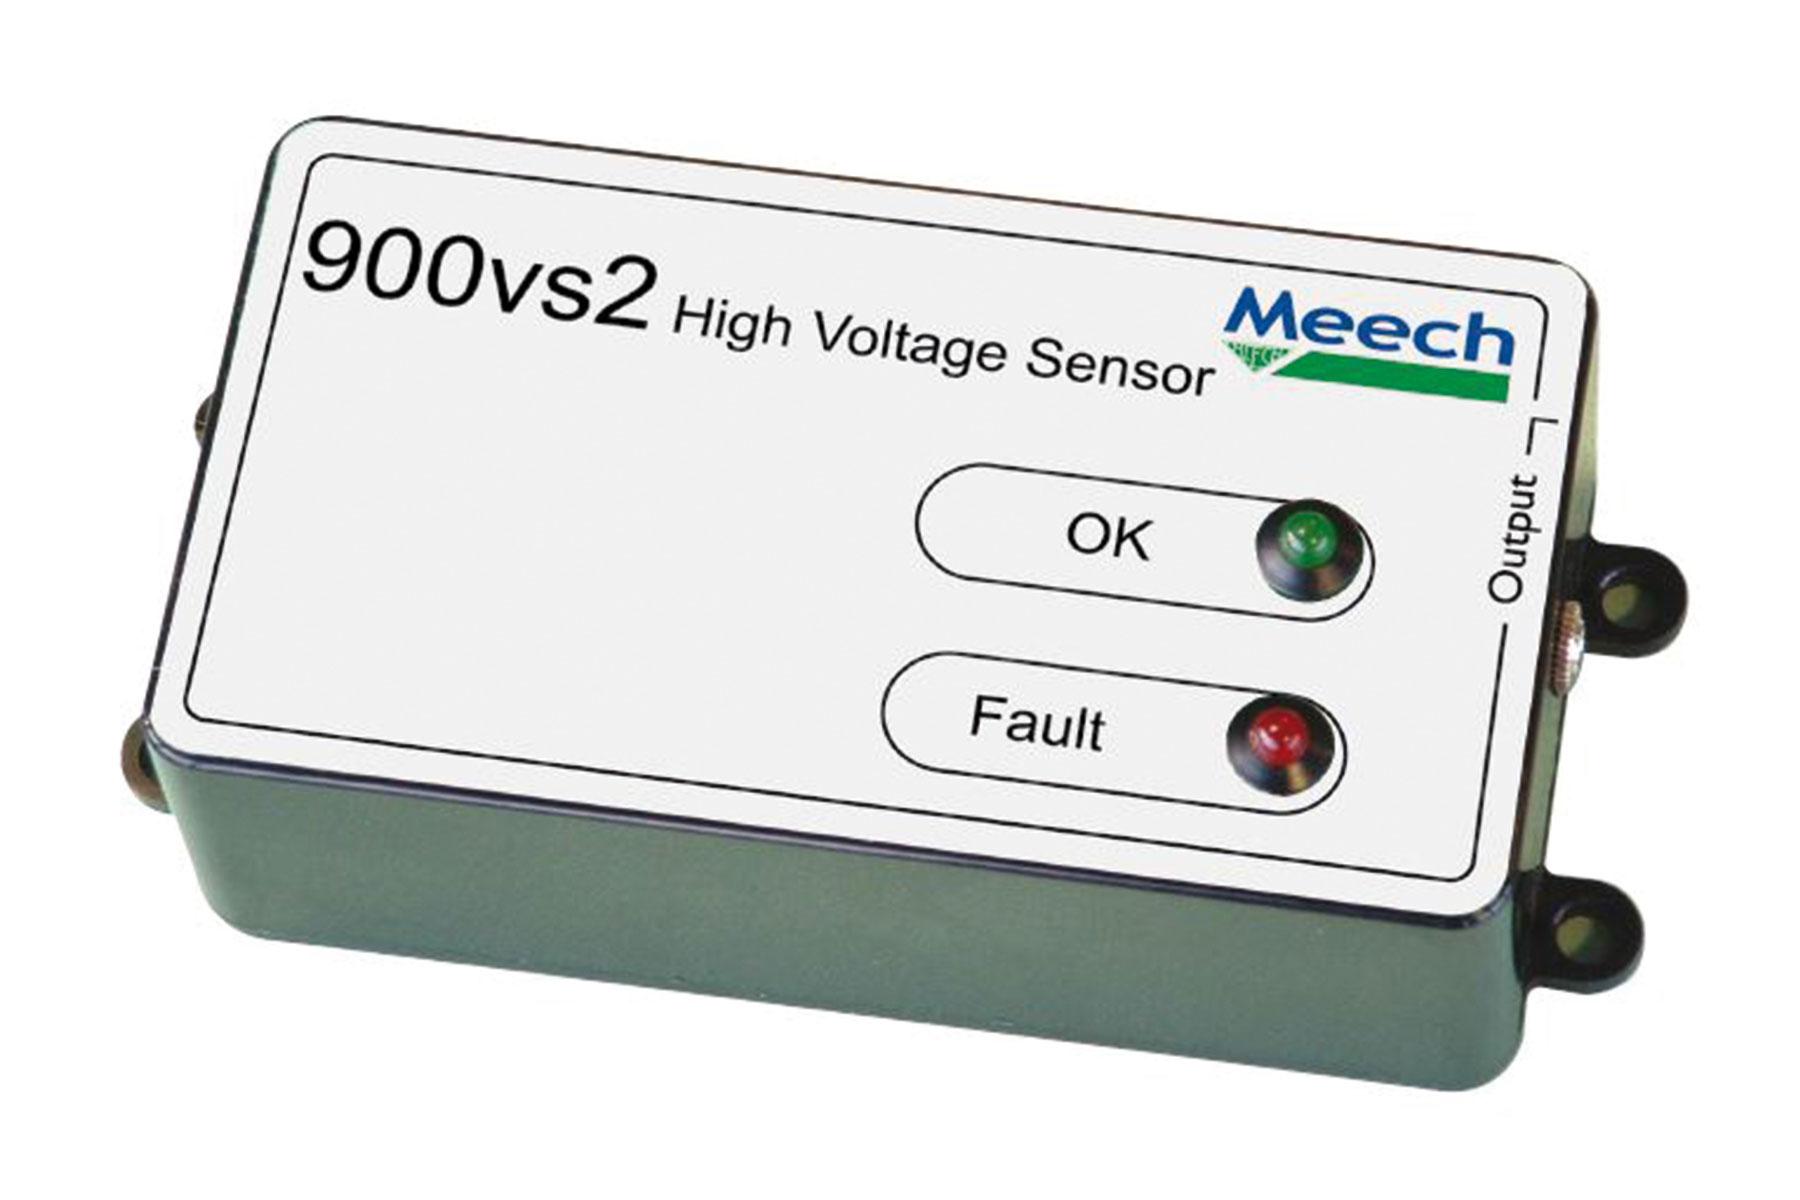 Detector de alto voltaje 900vs2